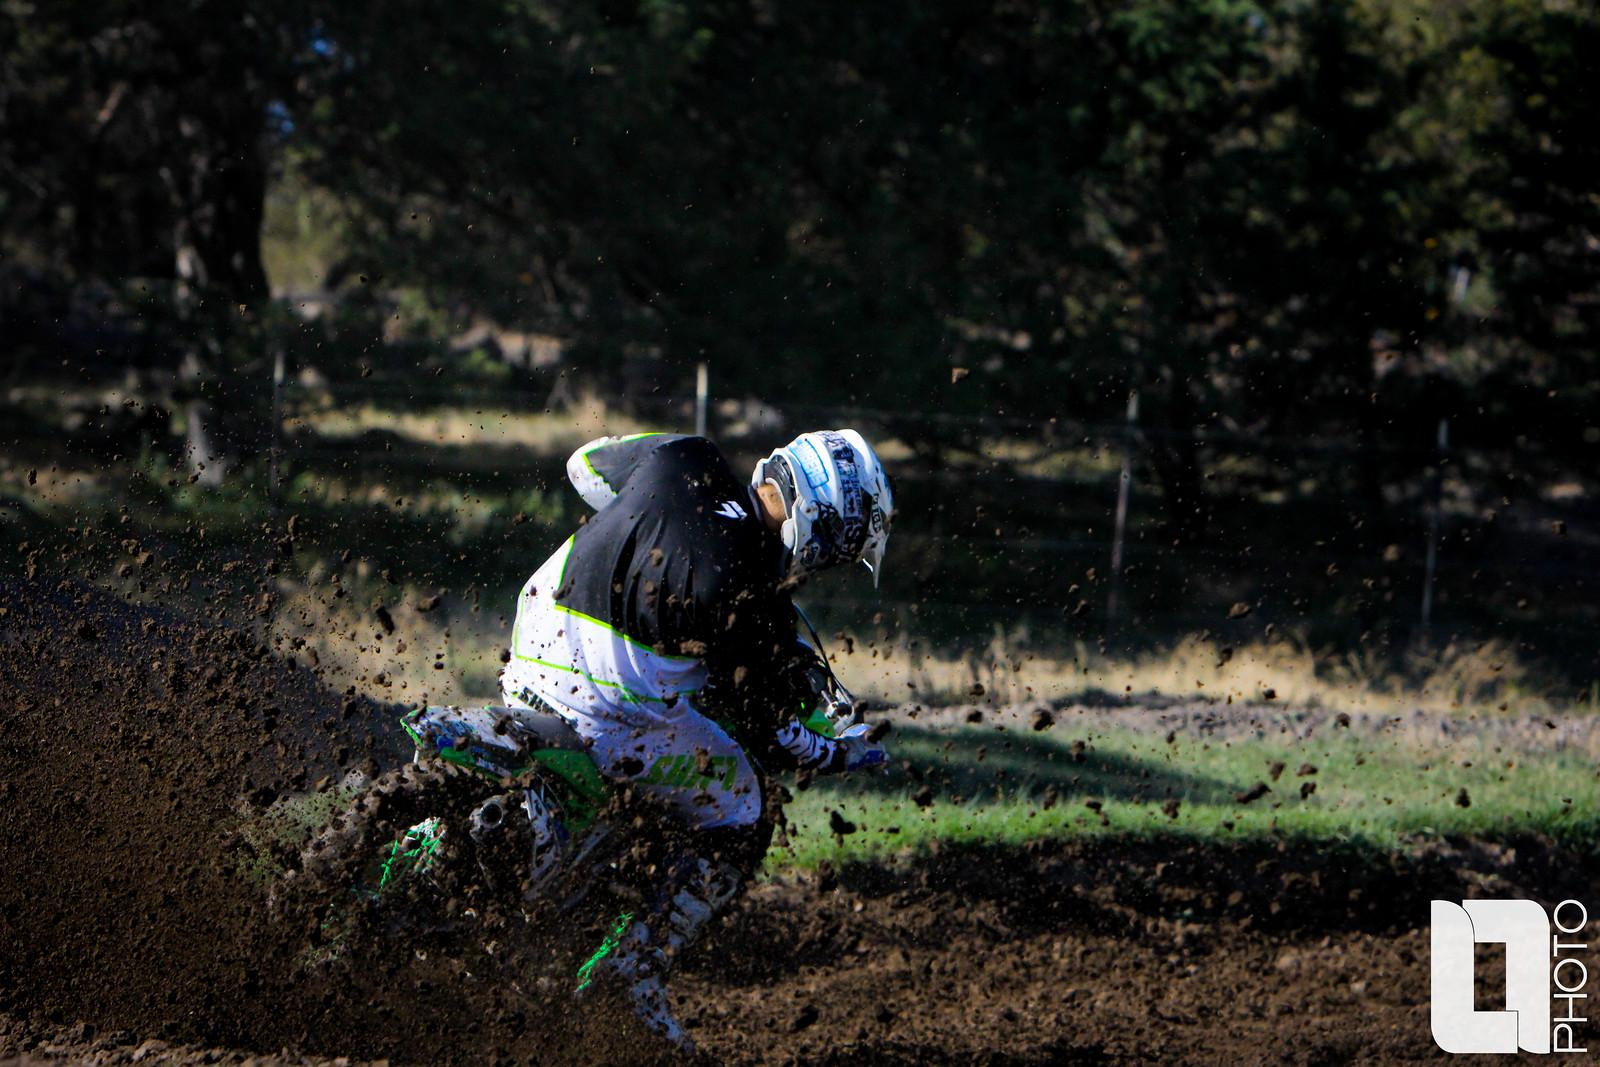 IMG 2903-2 - Oregonal Co. - Motocross Pictures - Vital MX